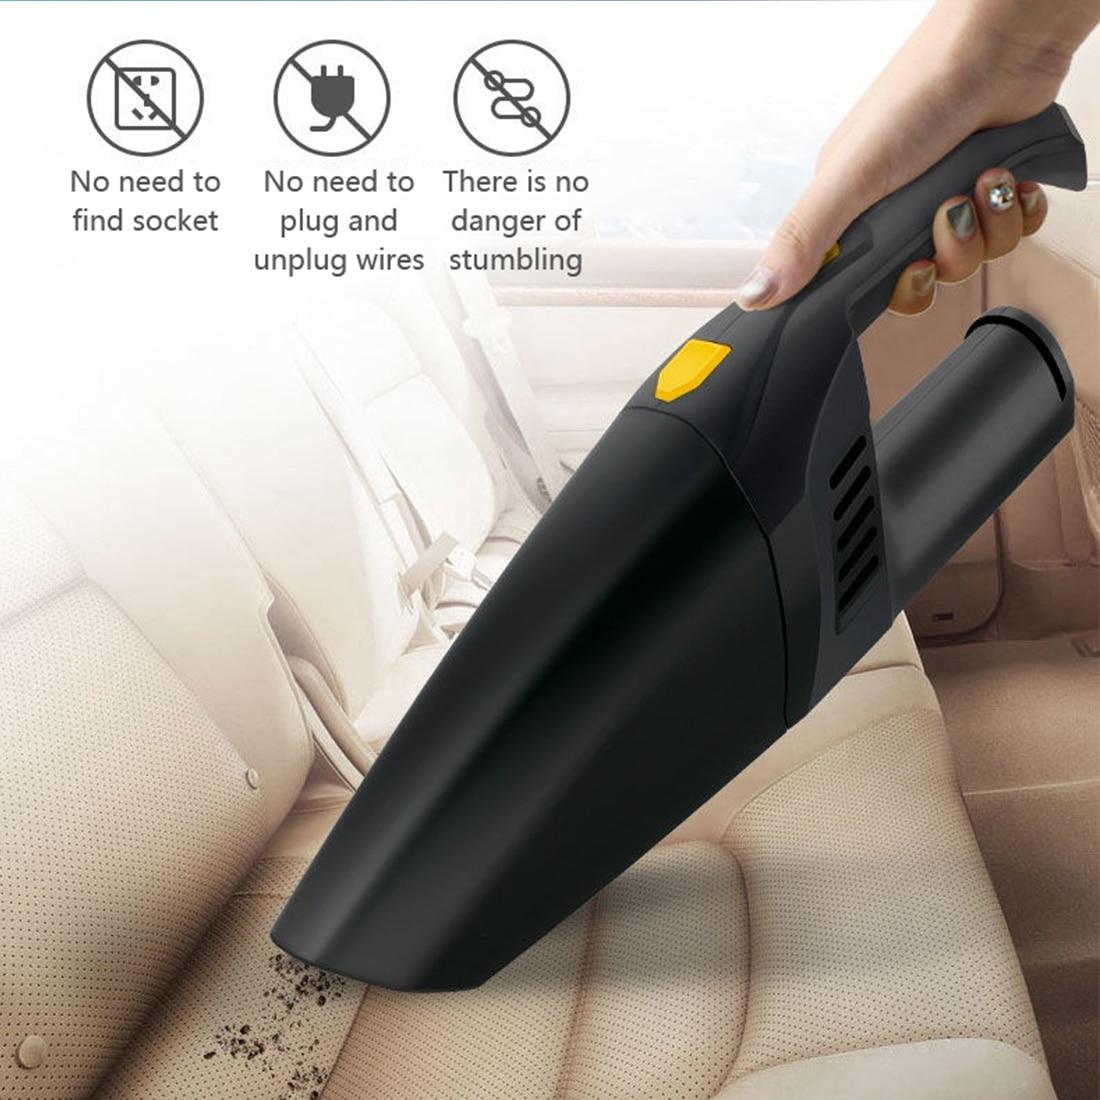 4500pa akülü el elektrikli süpürge küçük Mini taşınabilir araba oto ev elektrikli süpürge kablosuz ıslak kuru silgi otomatik ev